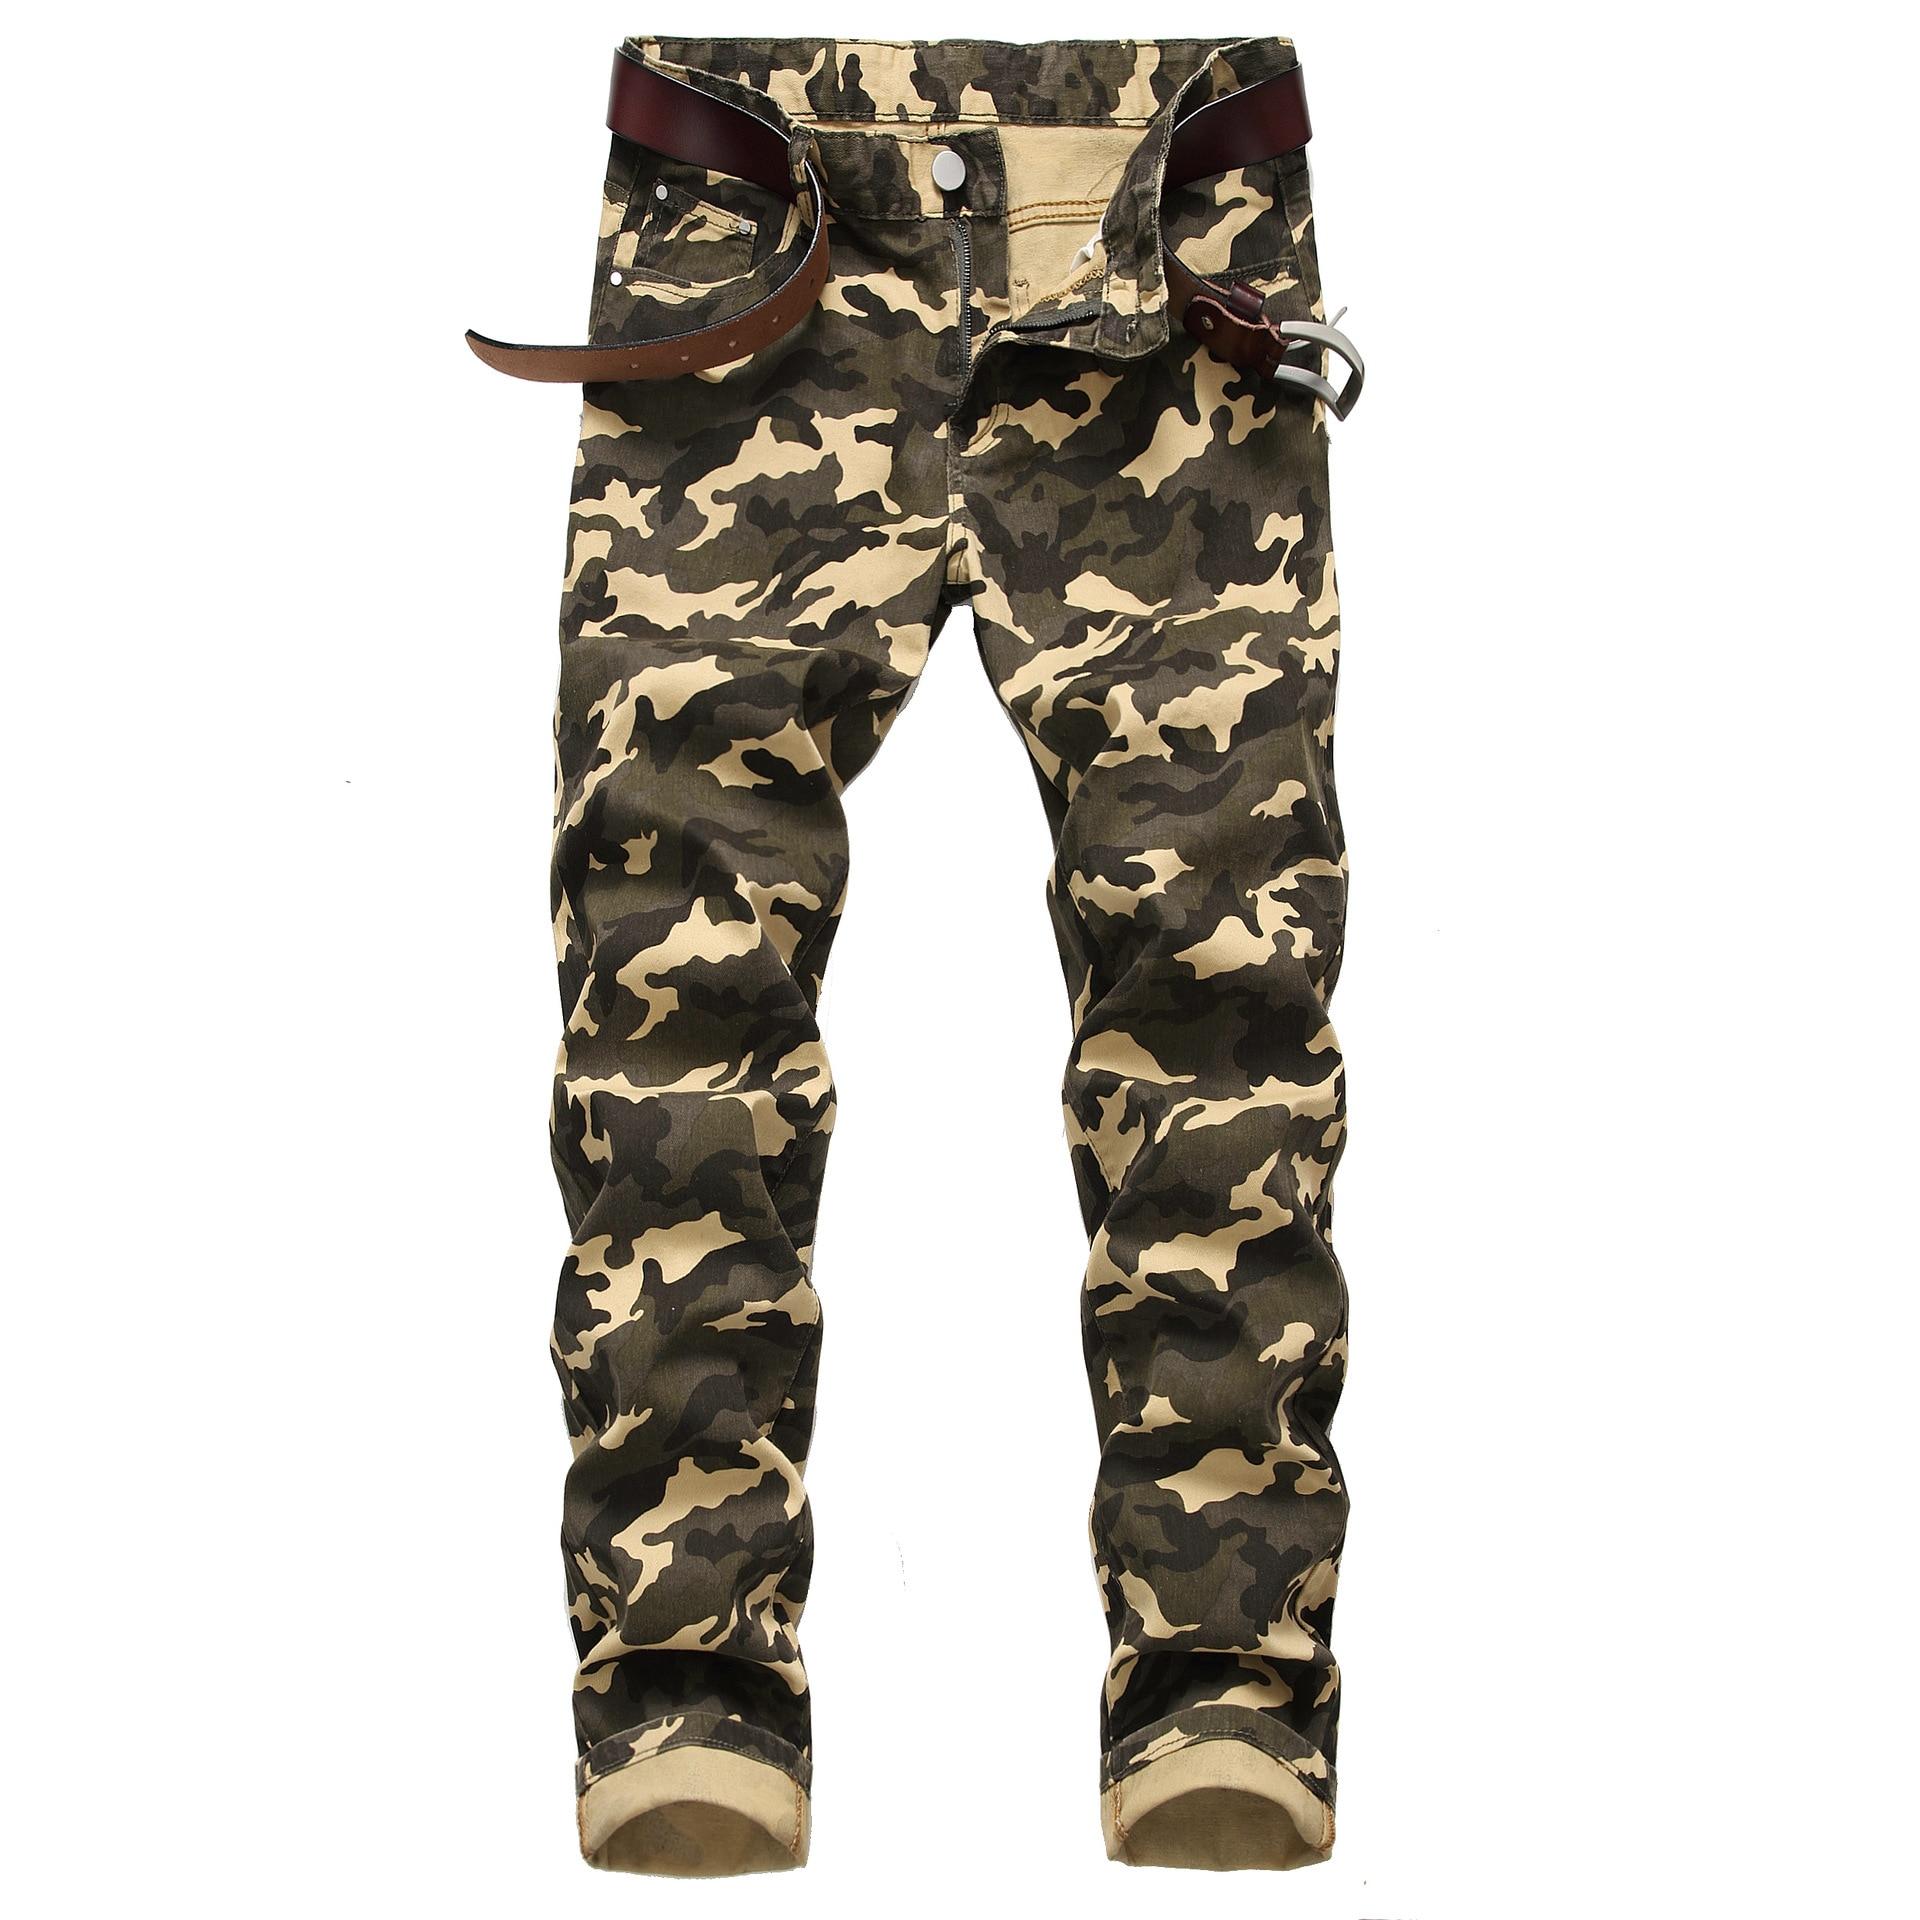 Elastic Jeans Men New Fashion Men's Camouflage Jeans Mens Slim Fit Camouflage Printed Casual Denim Pants Plus Size 28-44